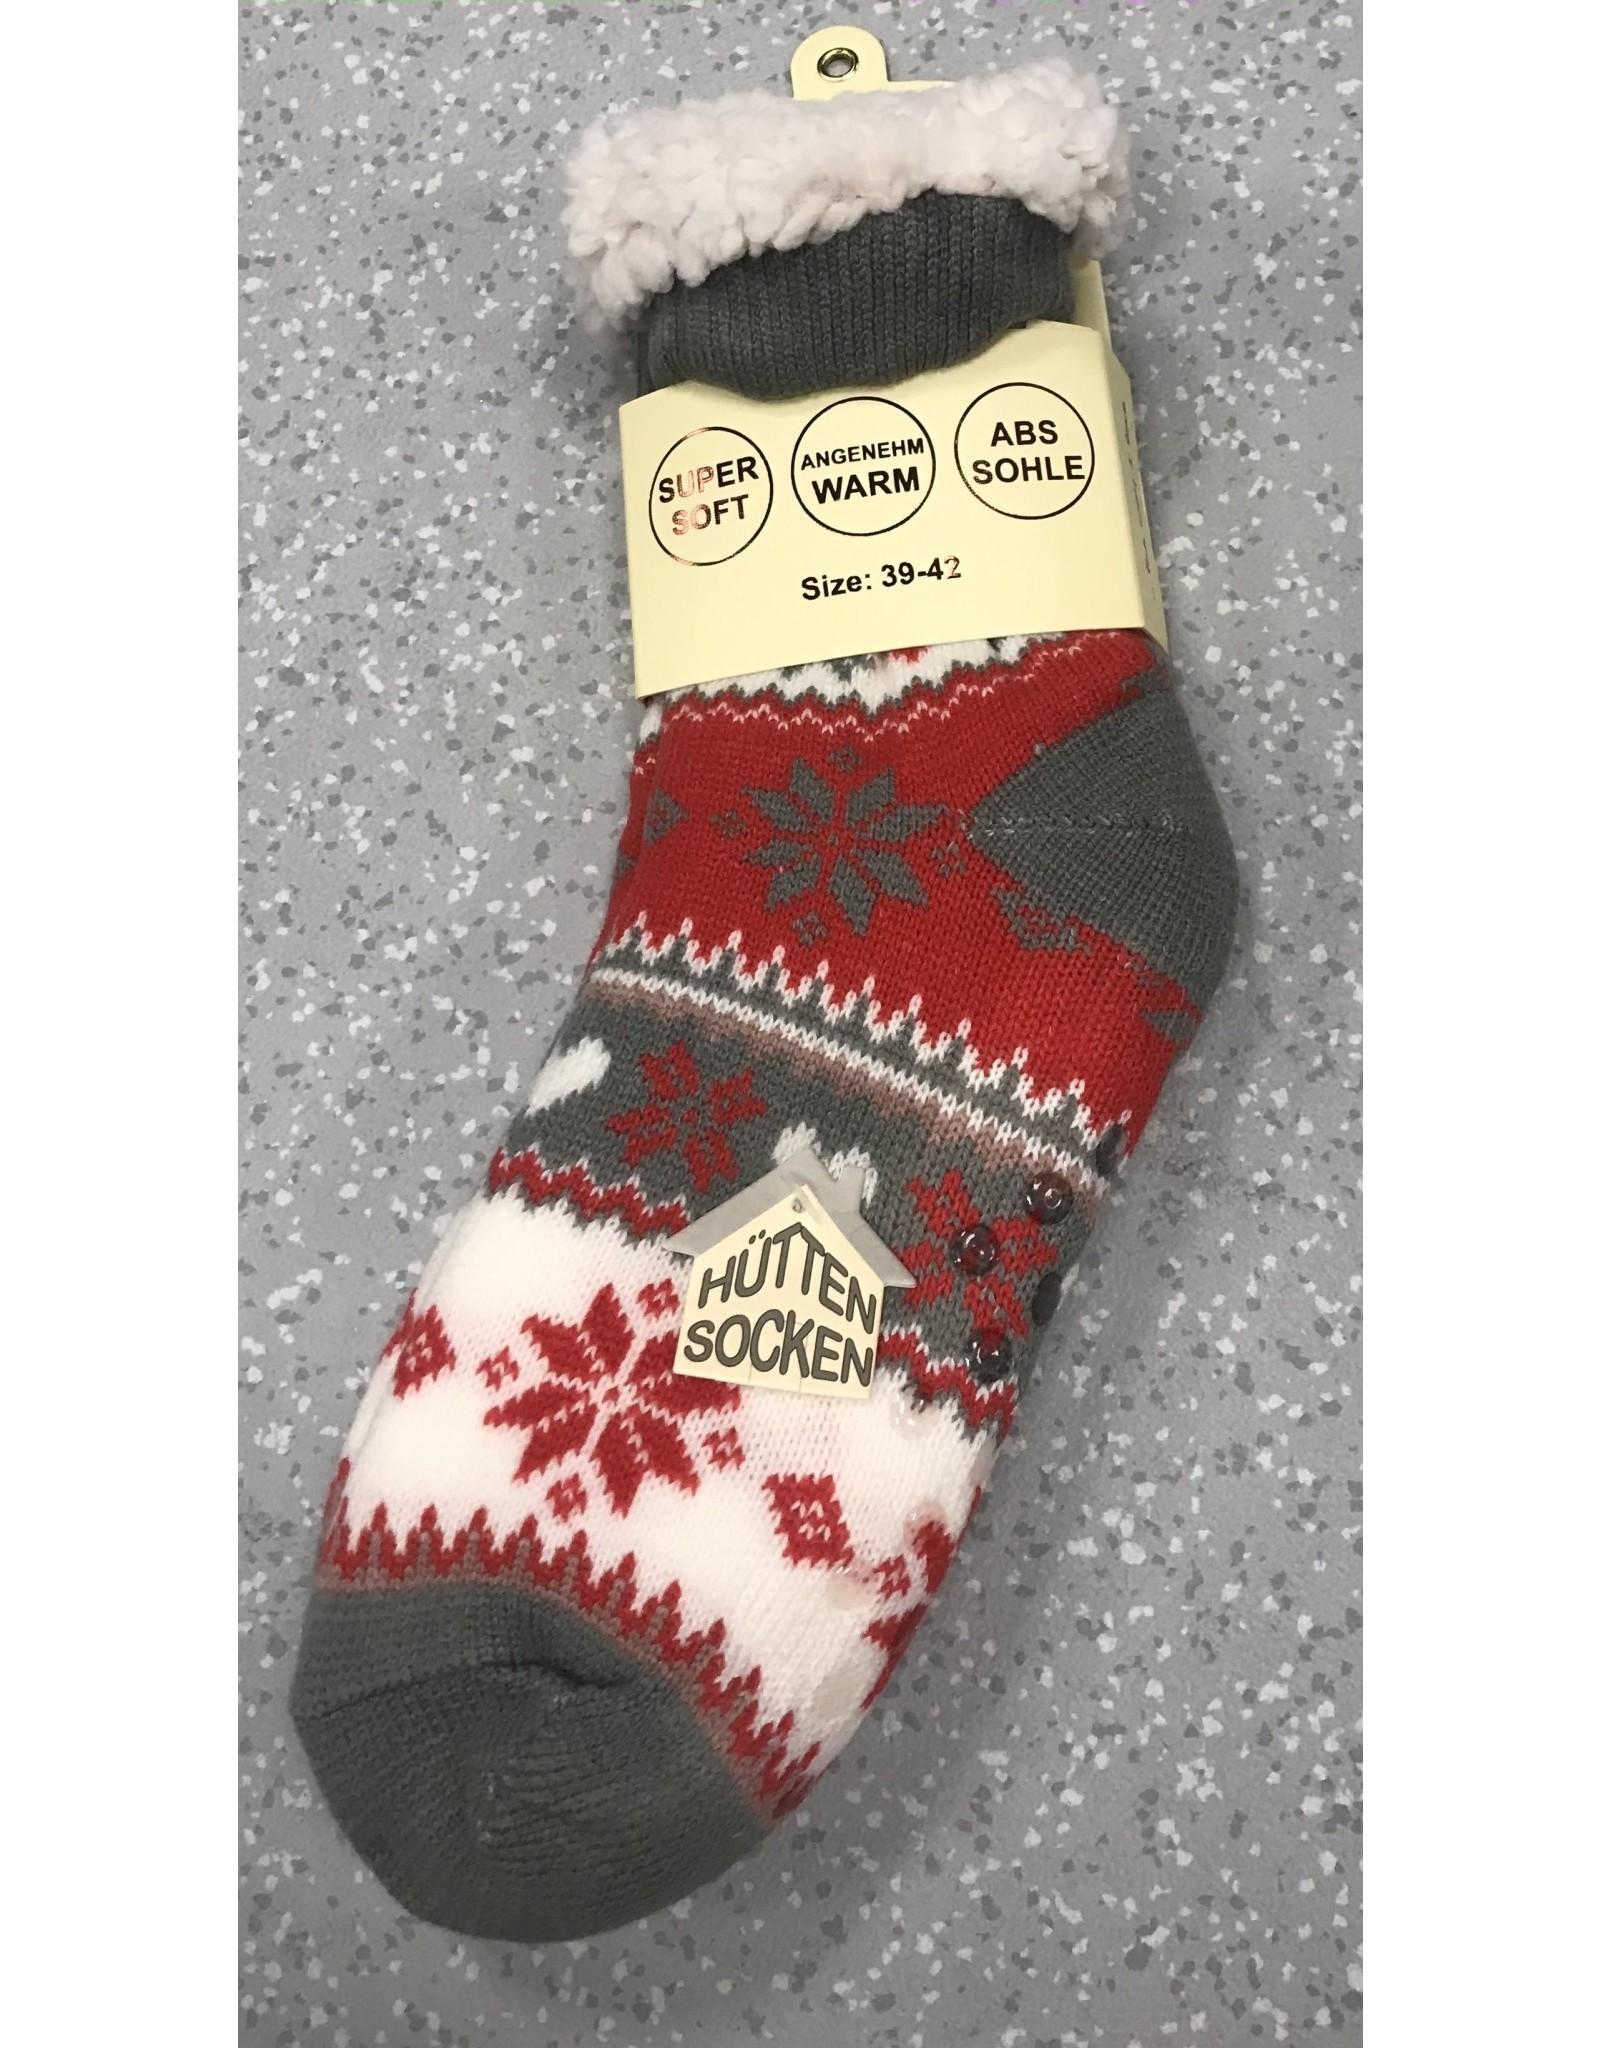 Lietho winter socks - Norway (pink/grey) (39-42)